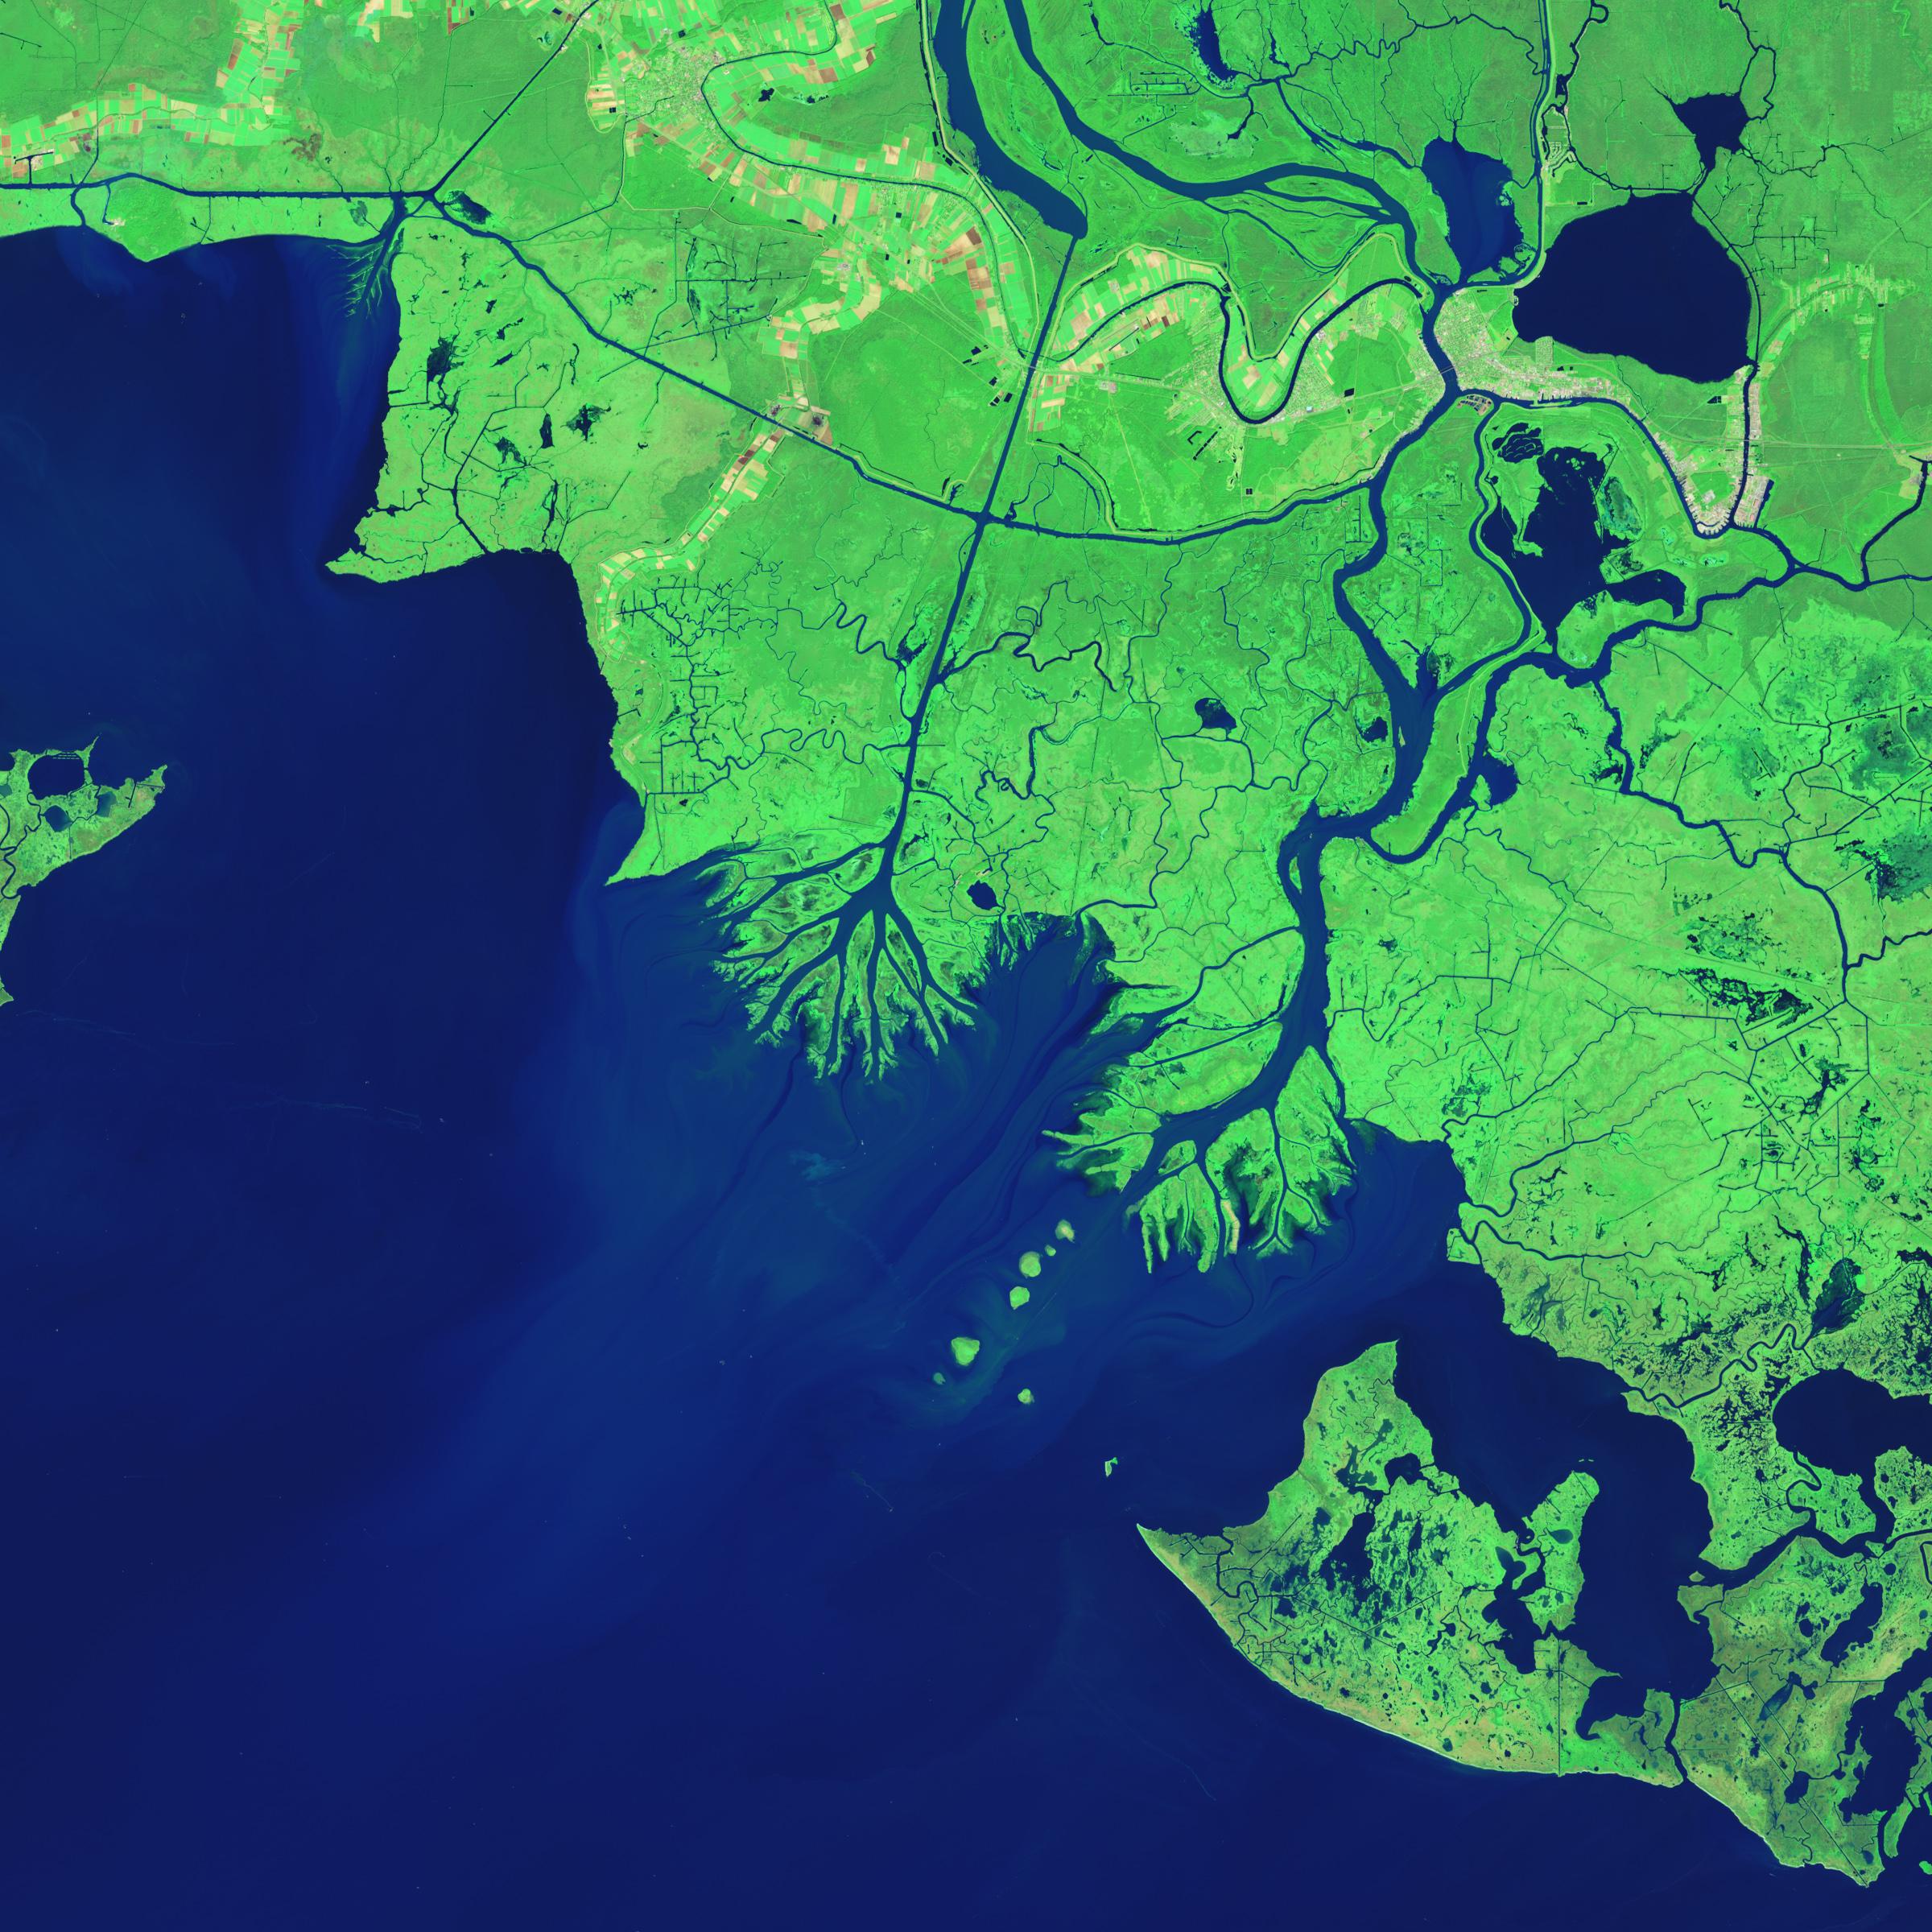 Nasa earth images nasa growing deltas in atchafalaya bay gumiabroncs Images